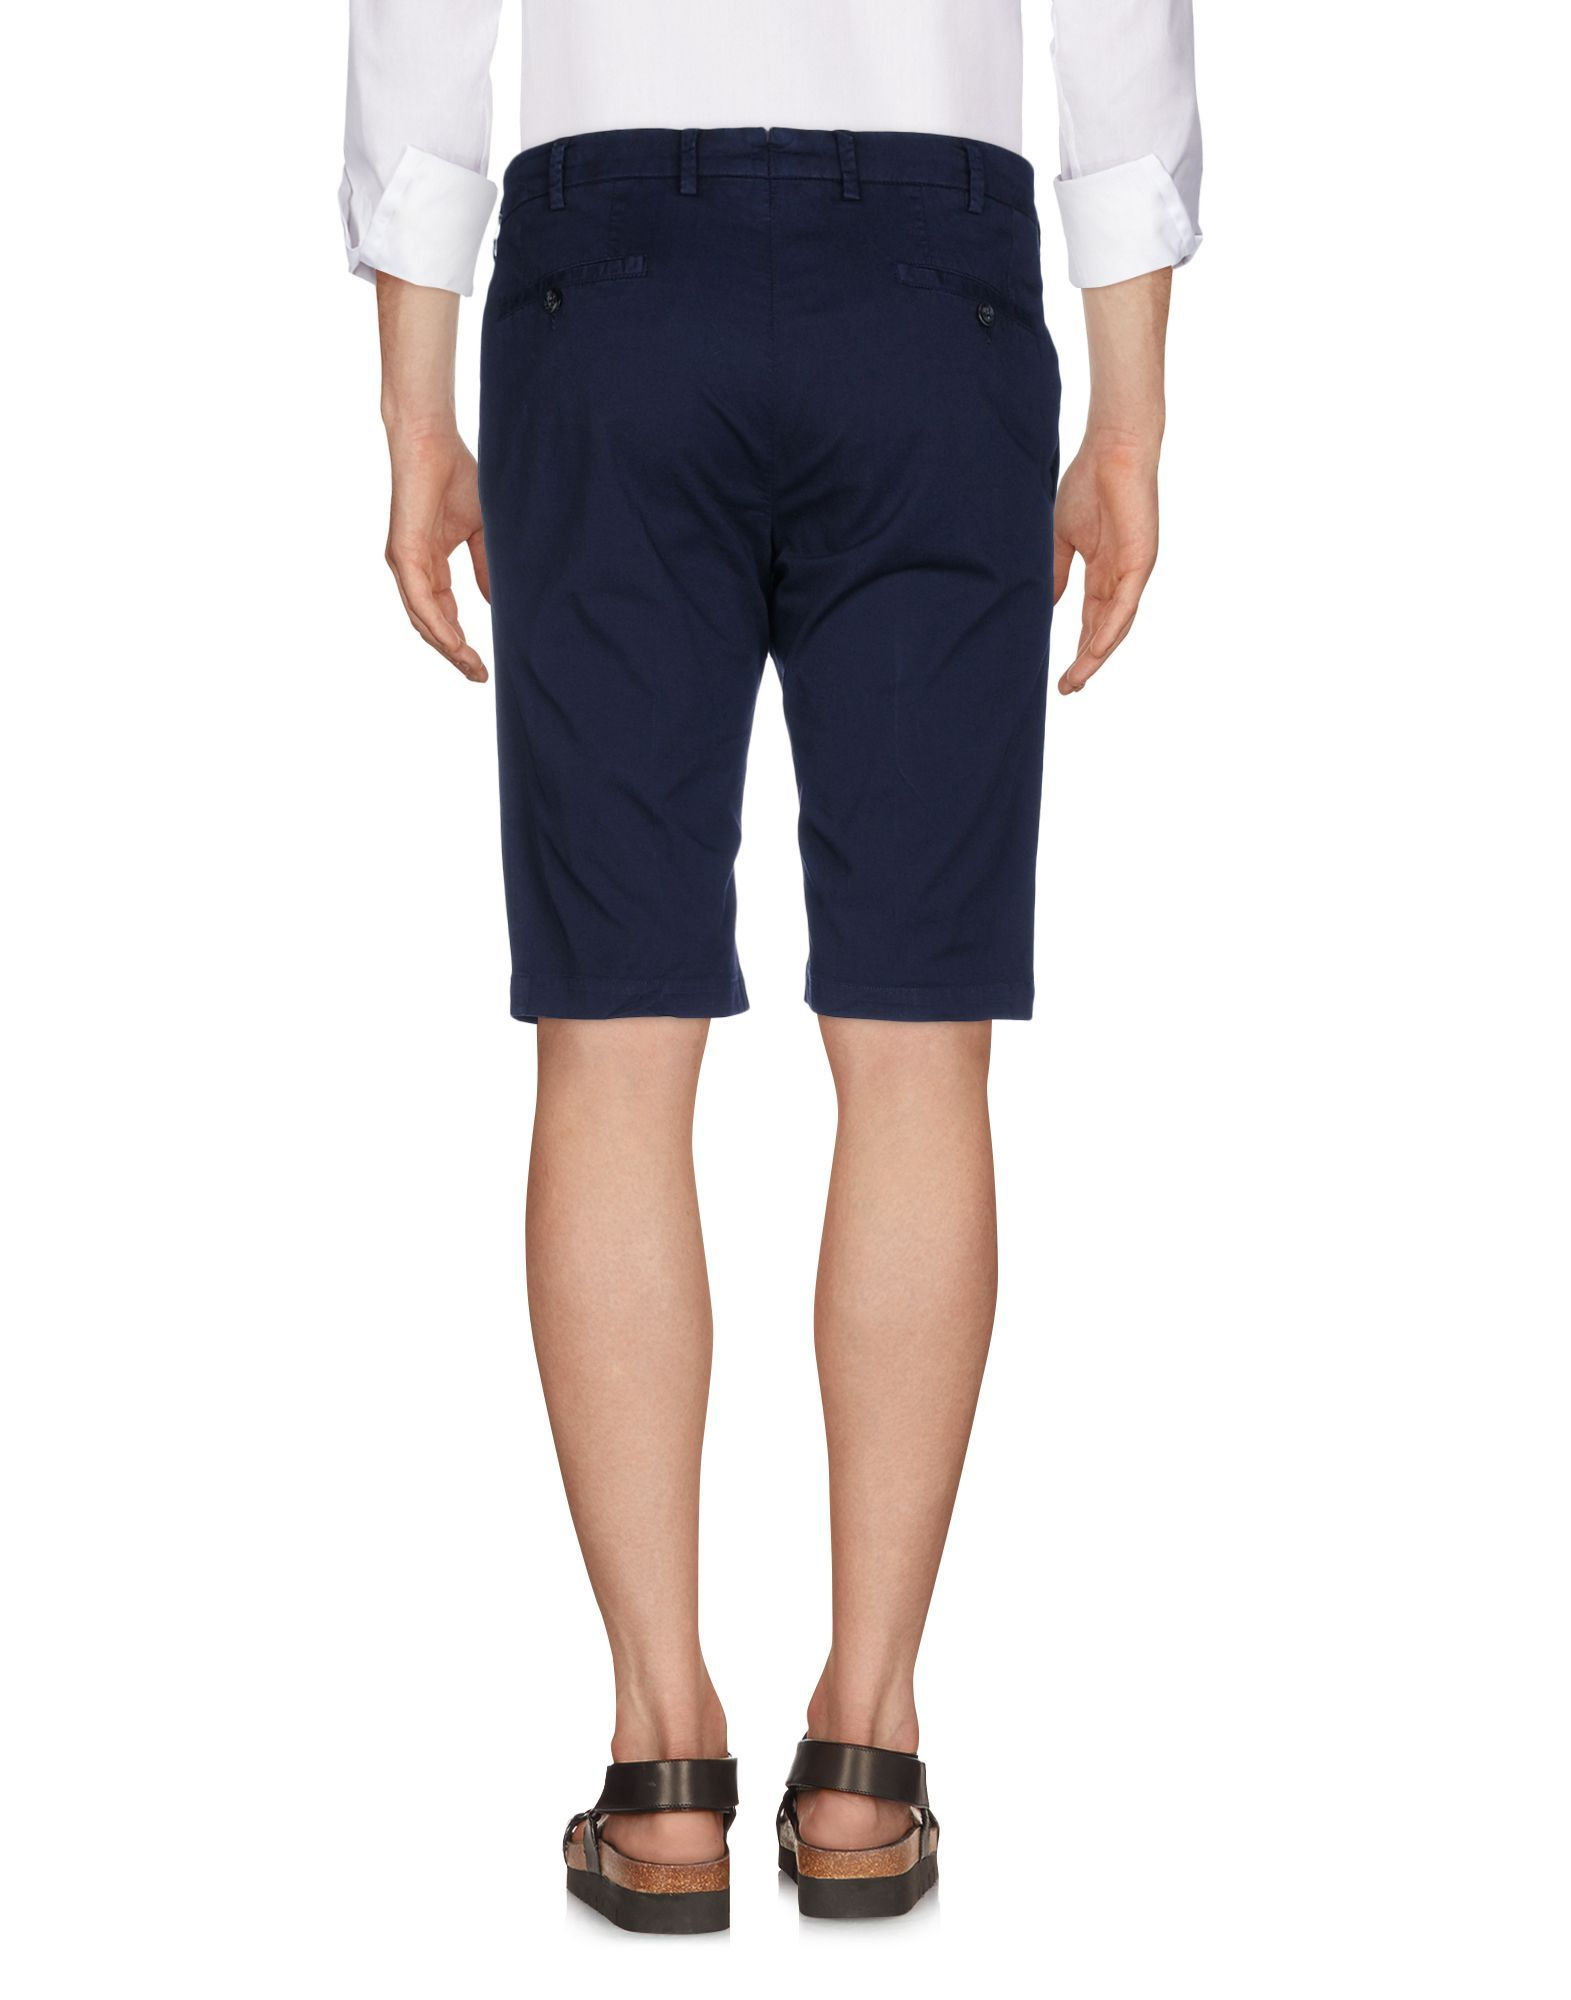 Tombolini Dark Blue Cotton Bermuda Shorts